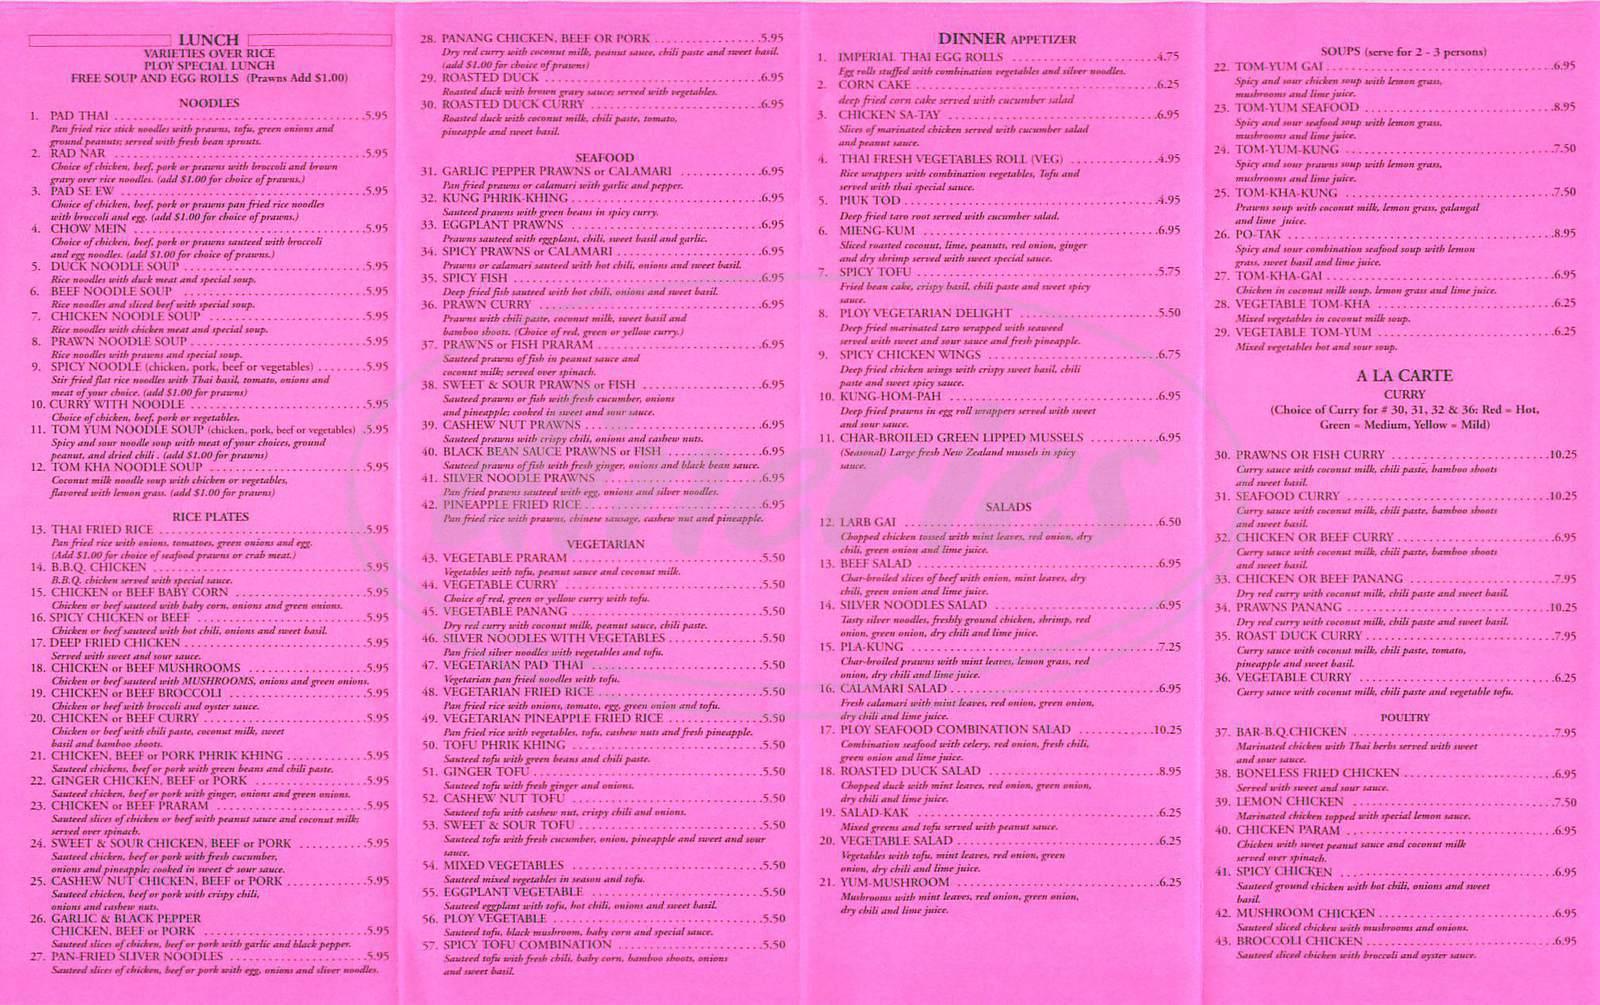 menu for Ploy II Thai Cuisine